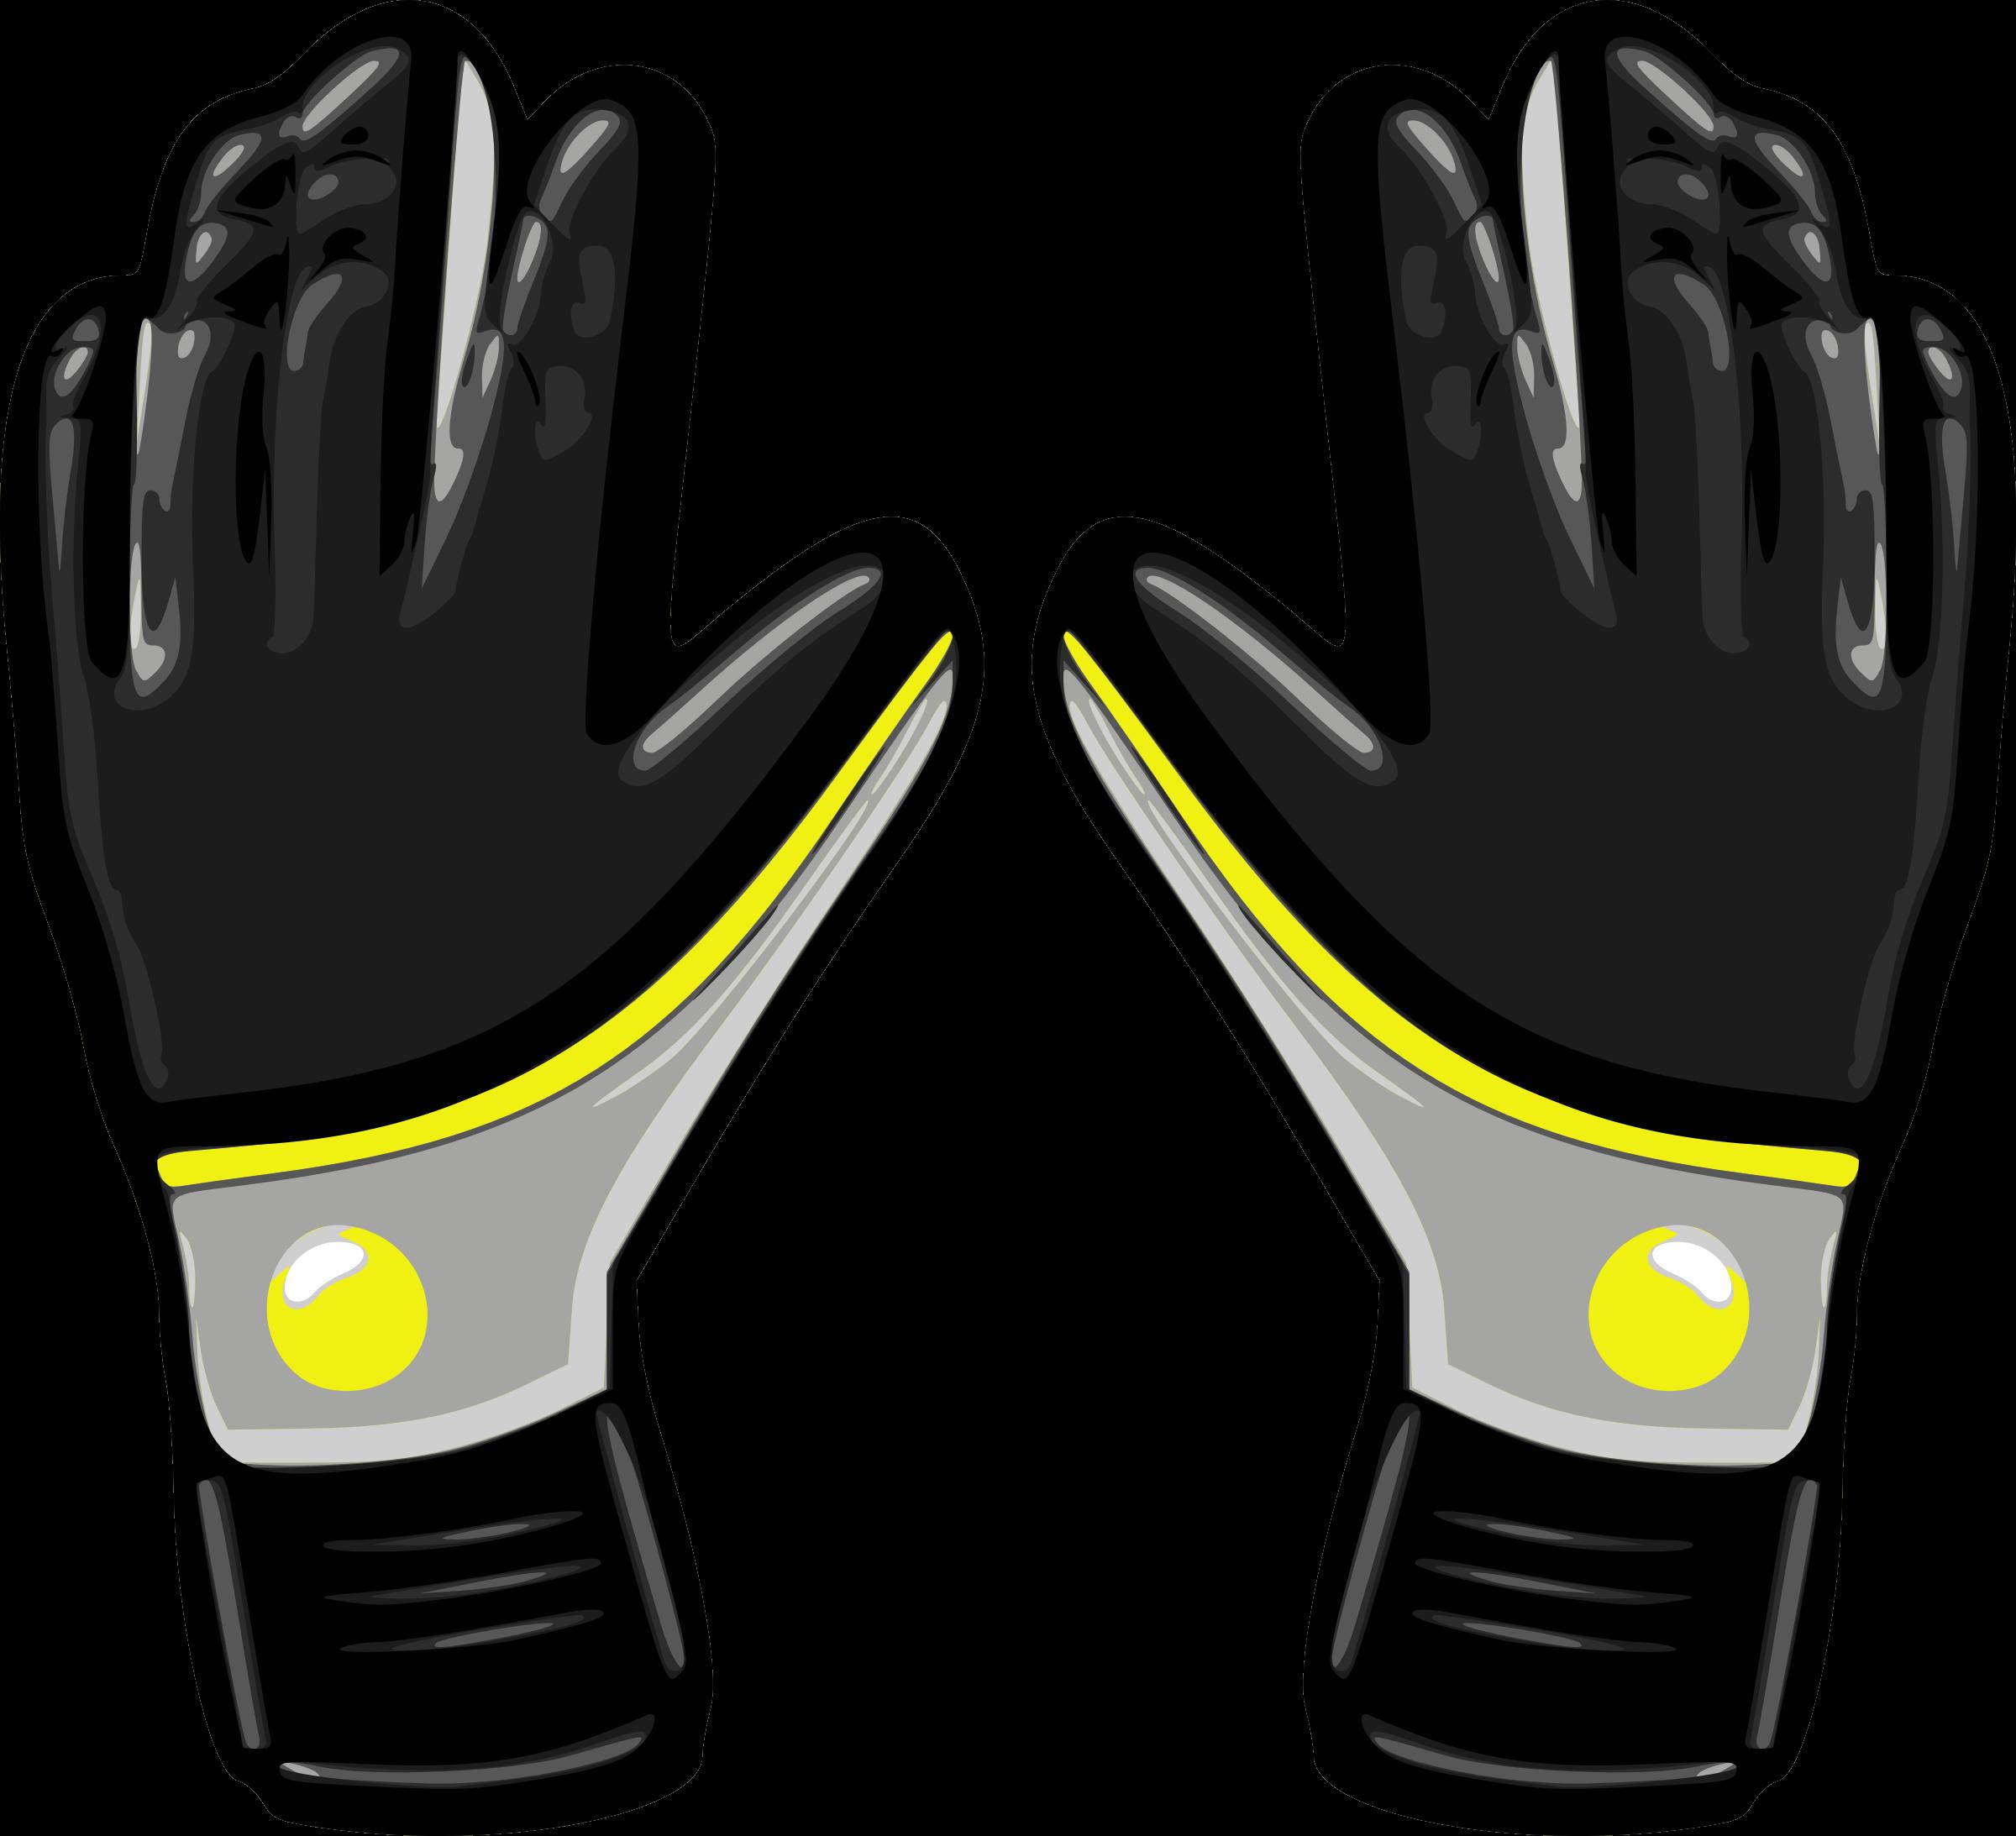 Glove clipart soccer glove. Gloves big image png